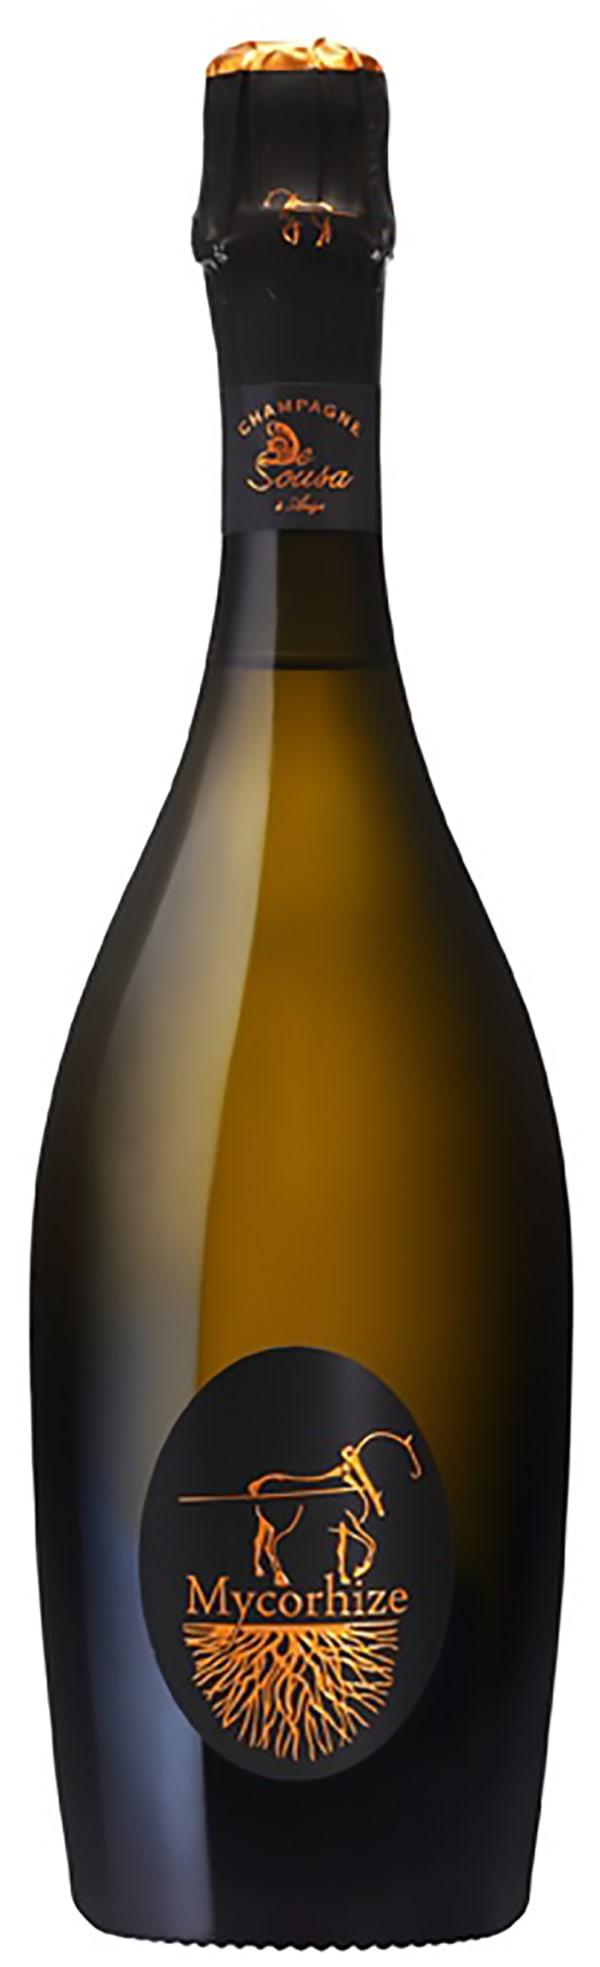 De Sousa Mycorhize Grand Cru Champagne Extra Brut